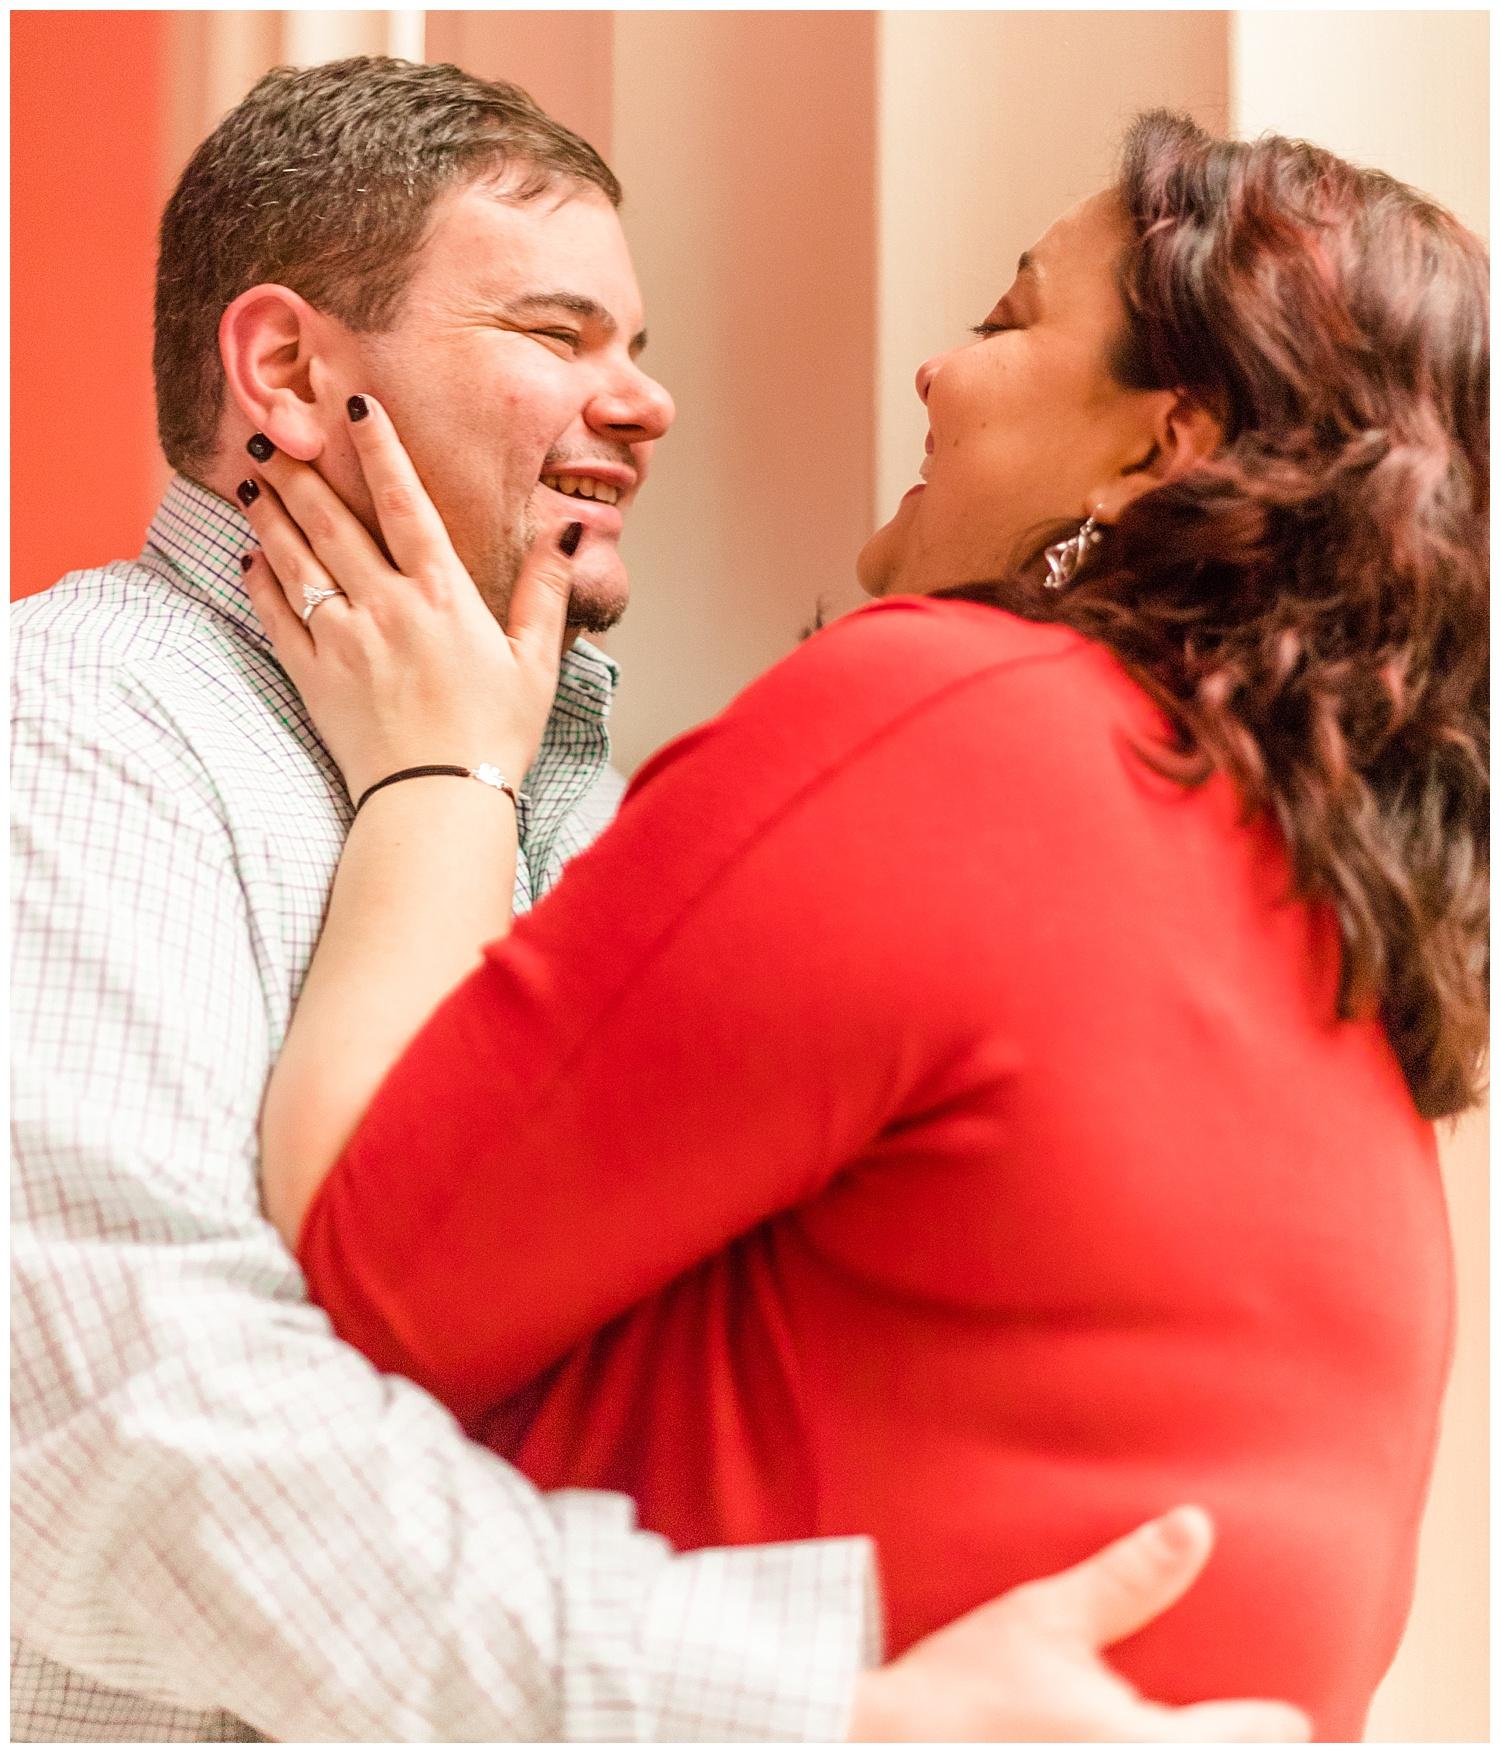 VMFA engagement photos - Richmond, Virginia